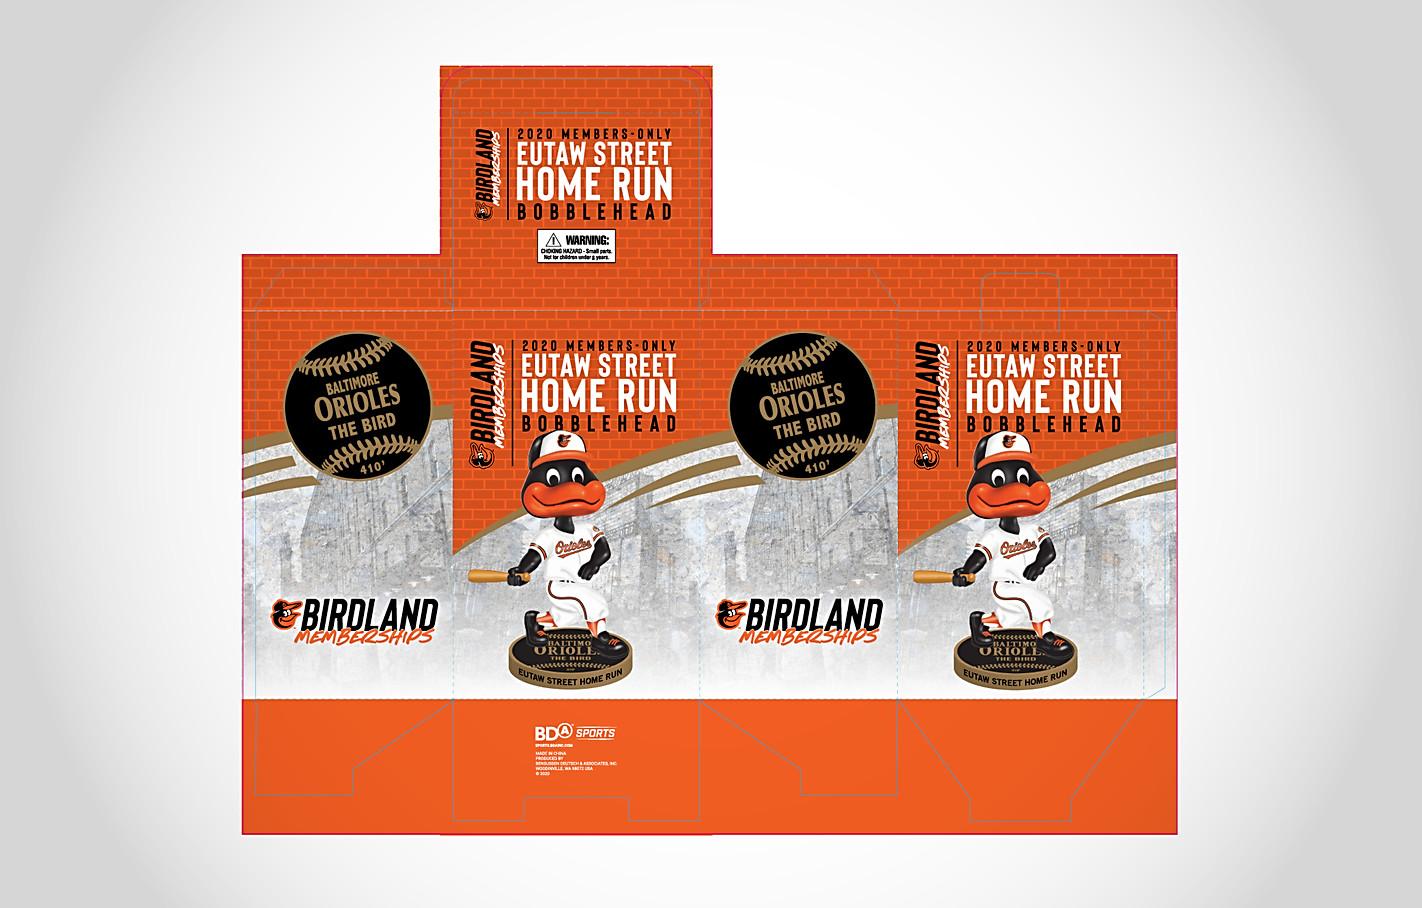 Orioles Home Run Bird Bobblehead Packaging